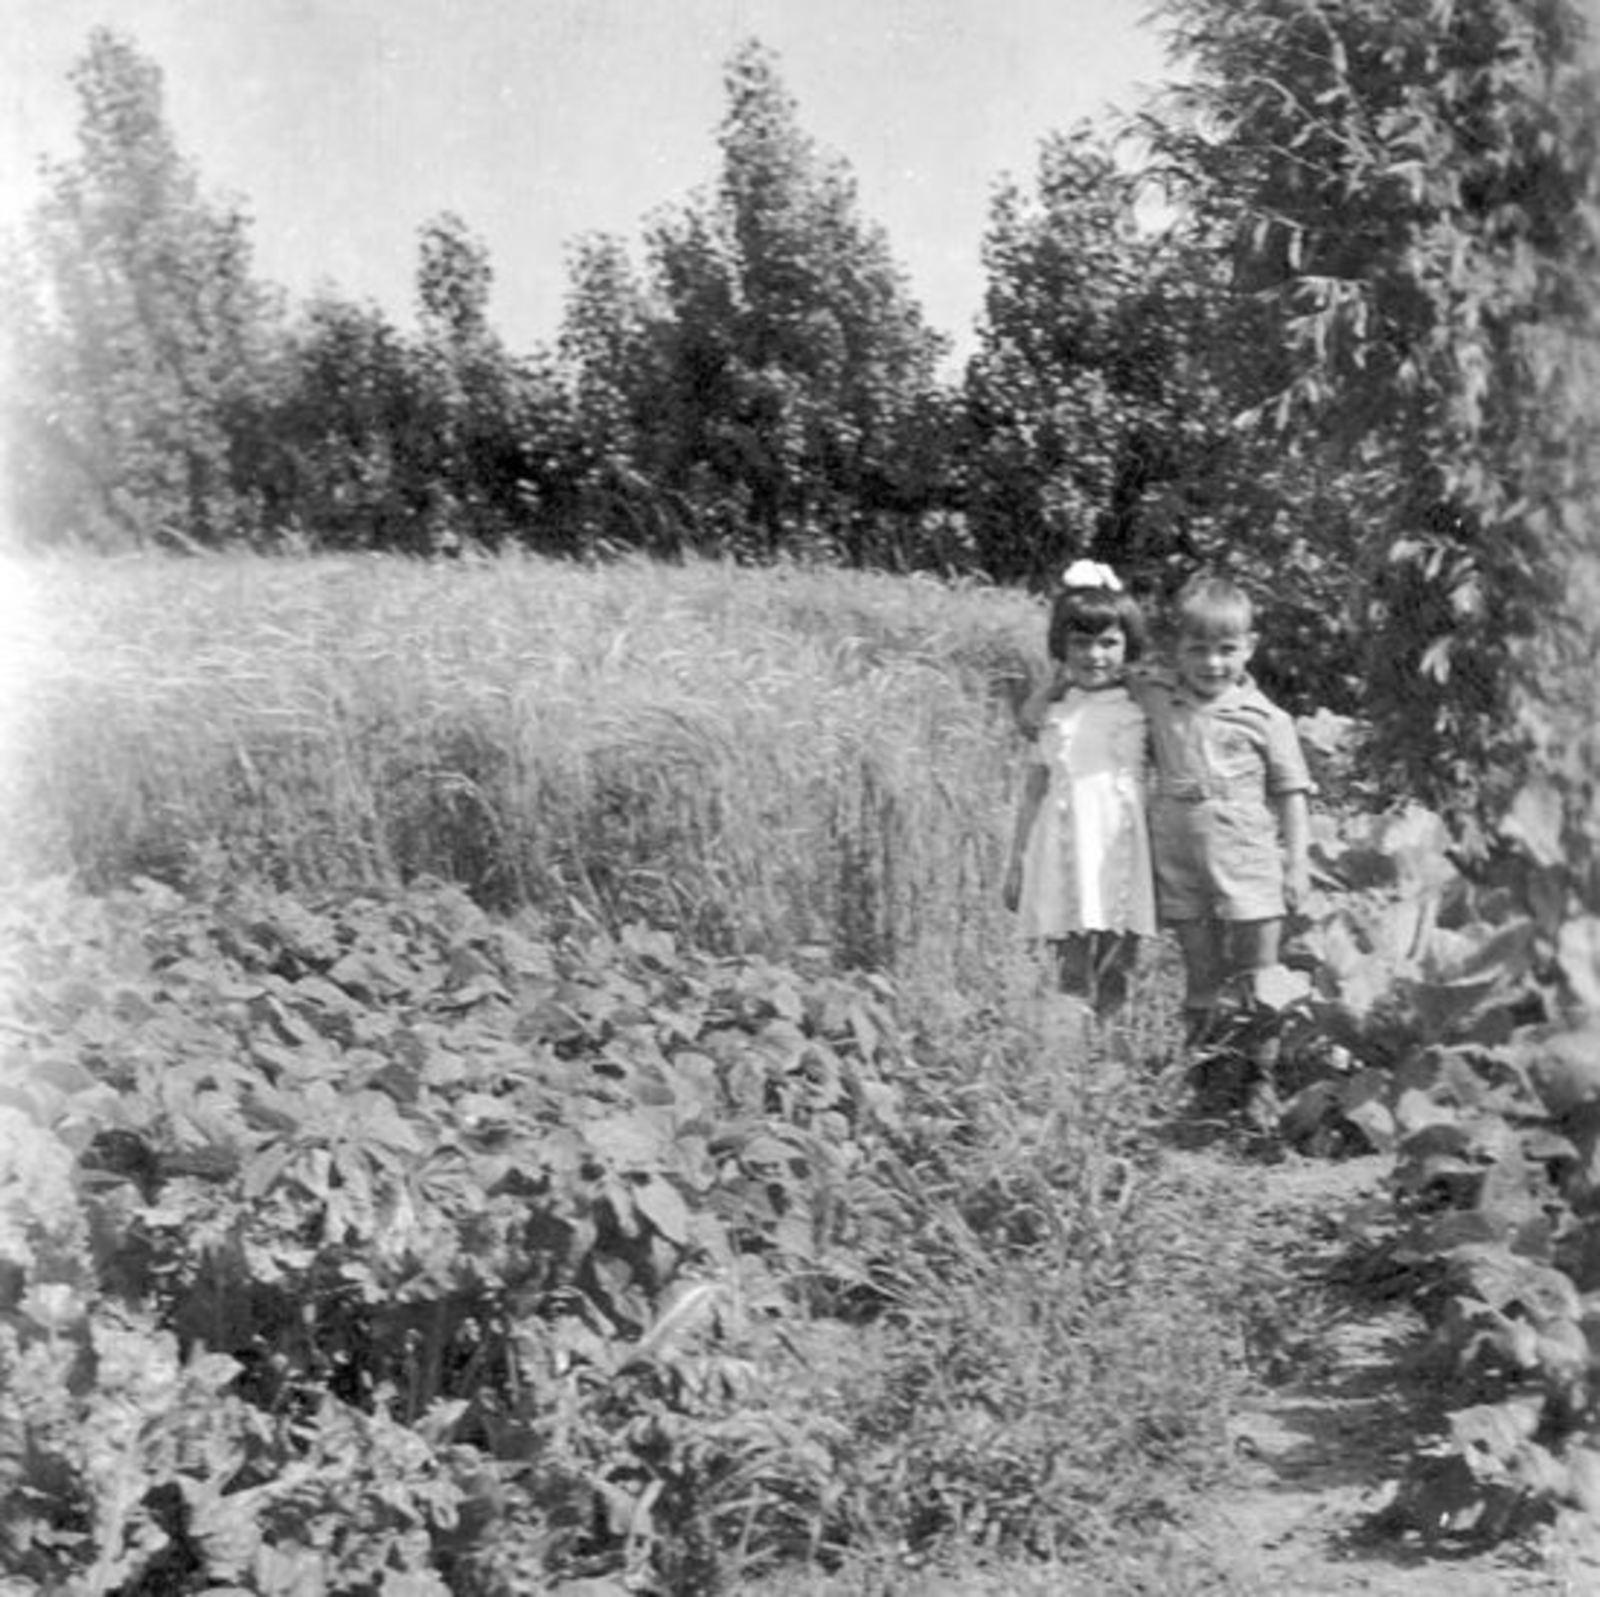 Groef Abraham vd 1882 19__ met Familie in Tuin 04